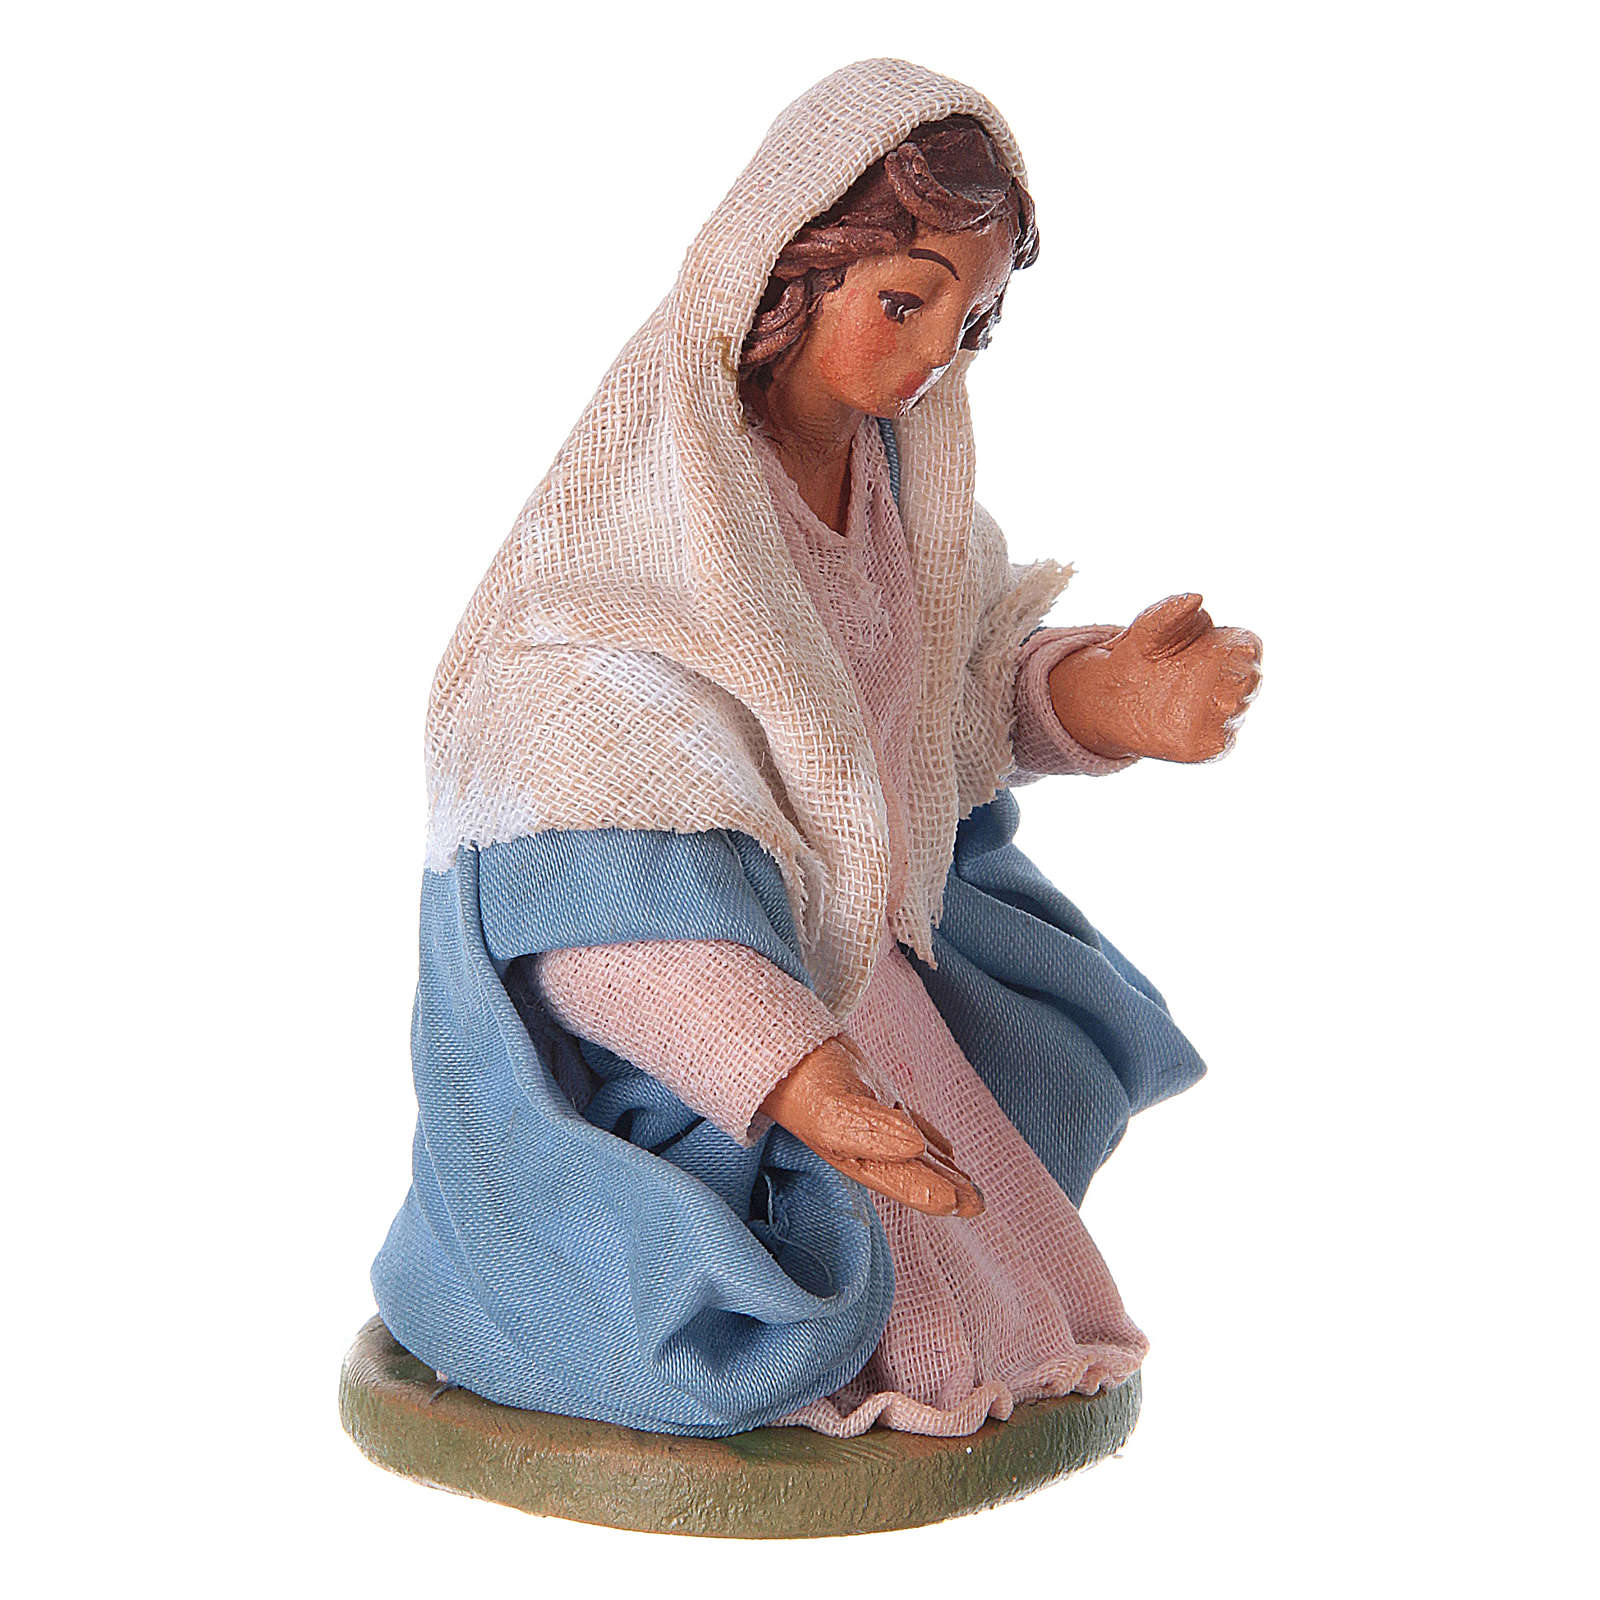 Neapolitan Nativity figurine, Virgin Mary, 10 cm 4